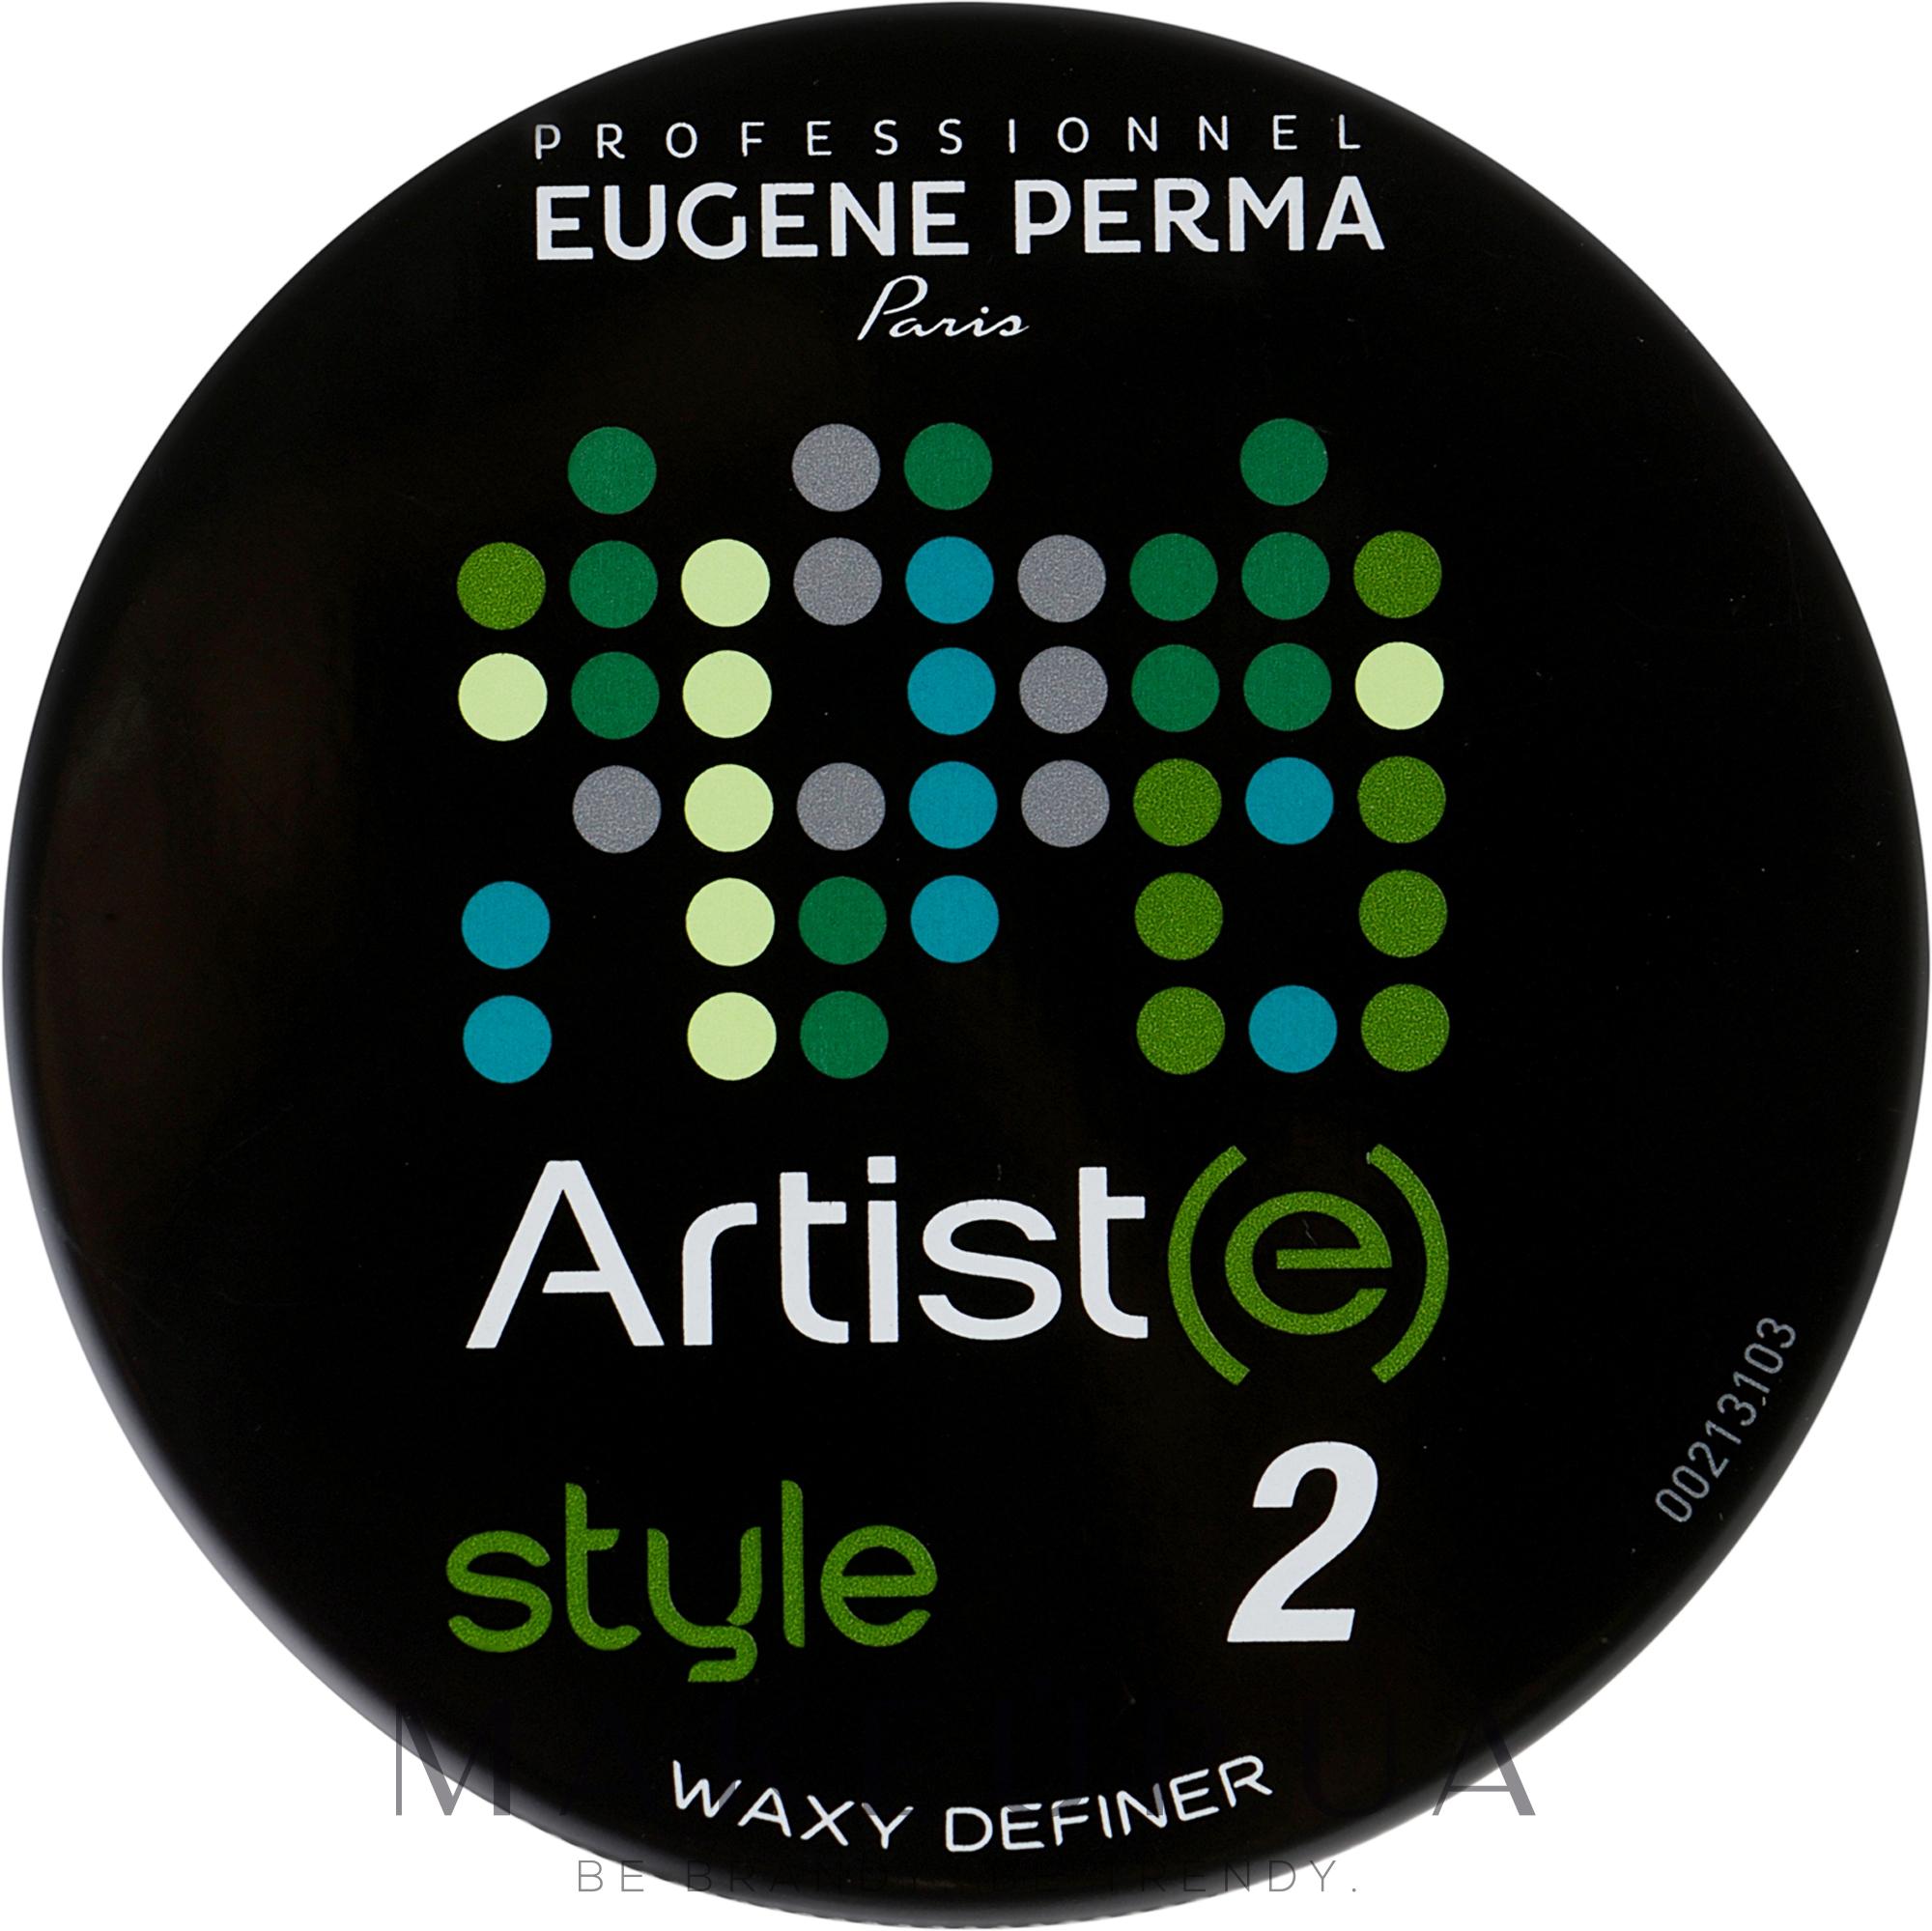 Віск для сяйва волосся - Eugene Perma Artist(e) Brilliance — фото 75g